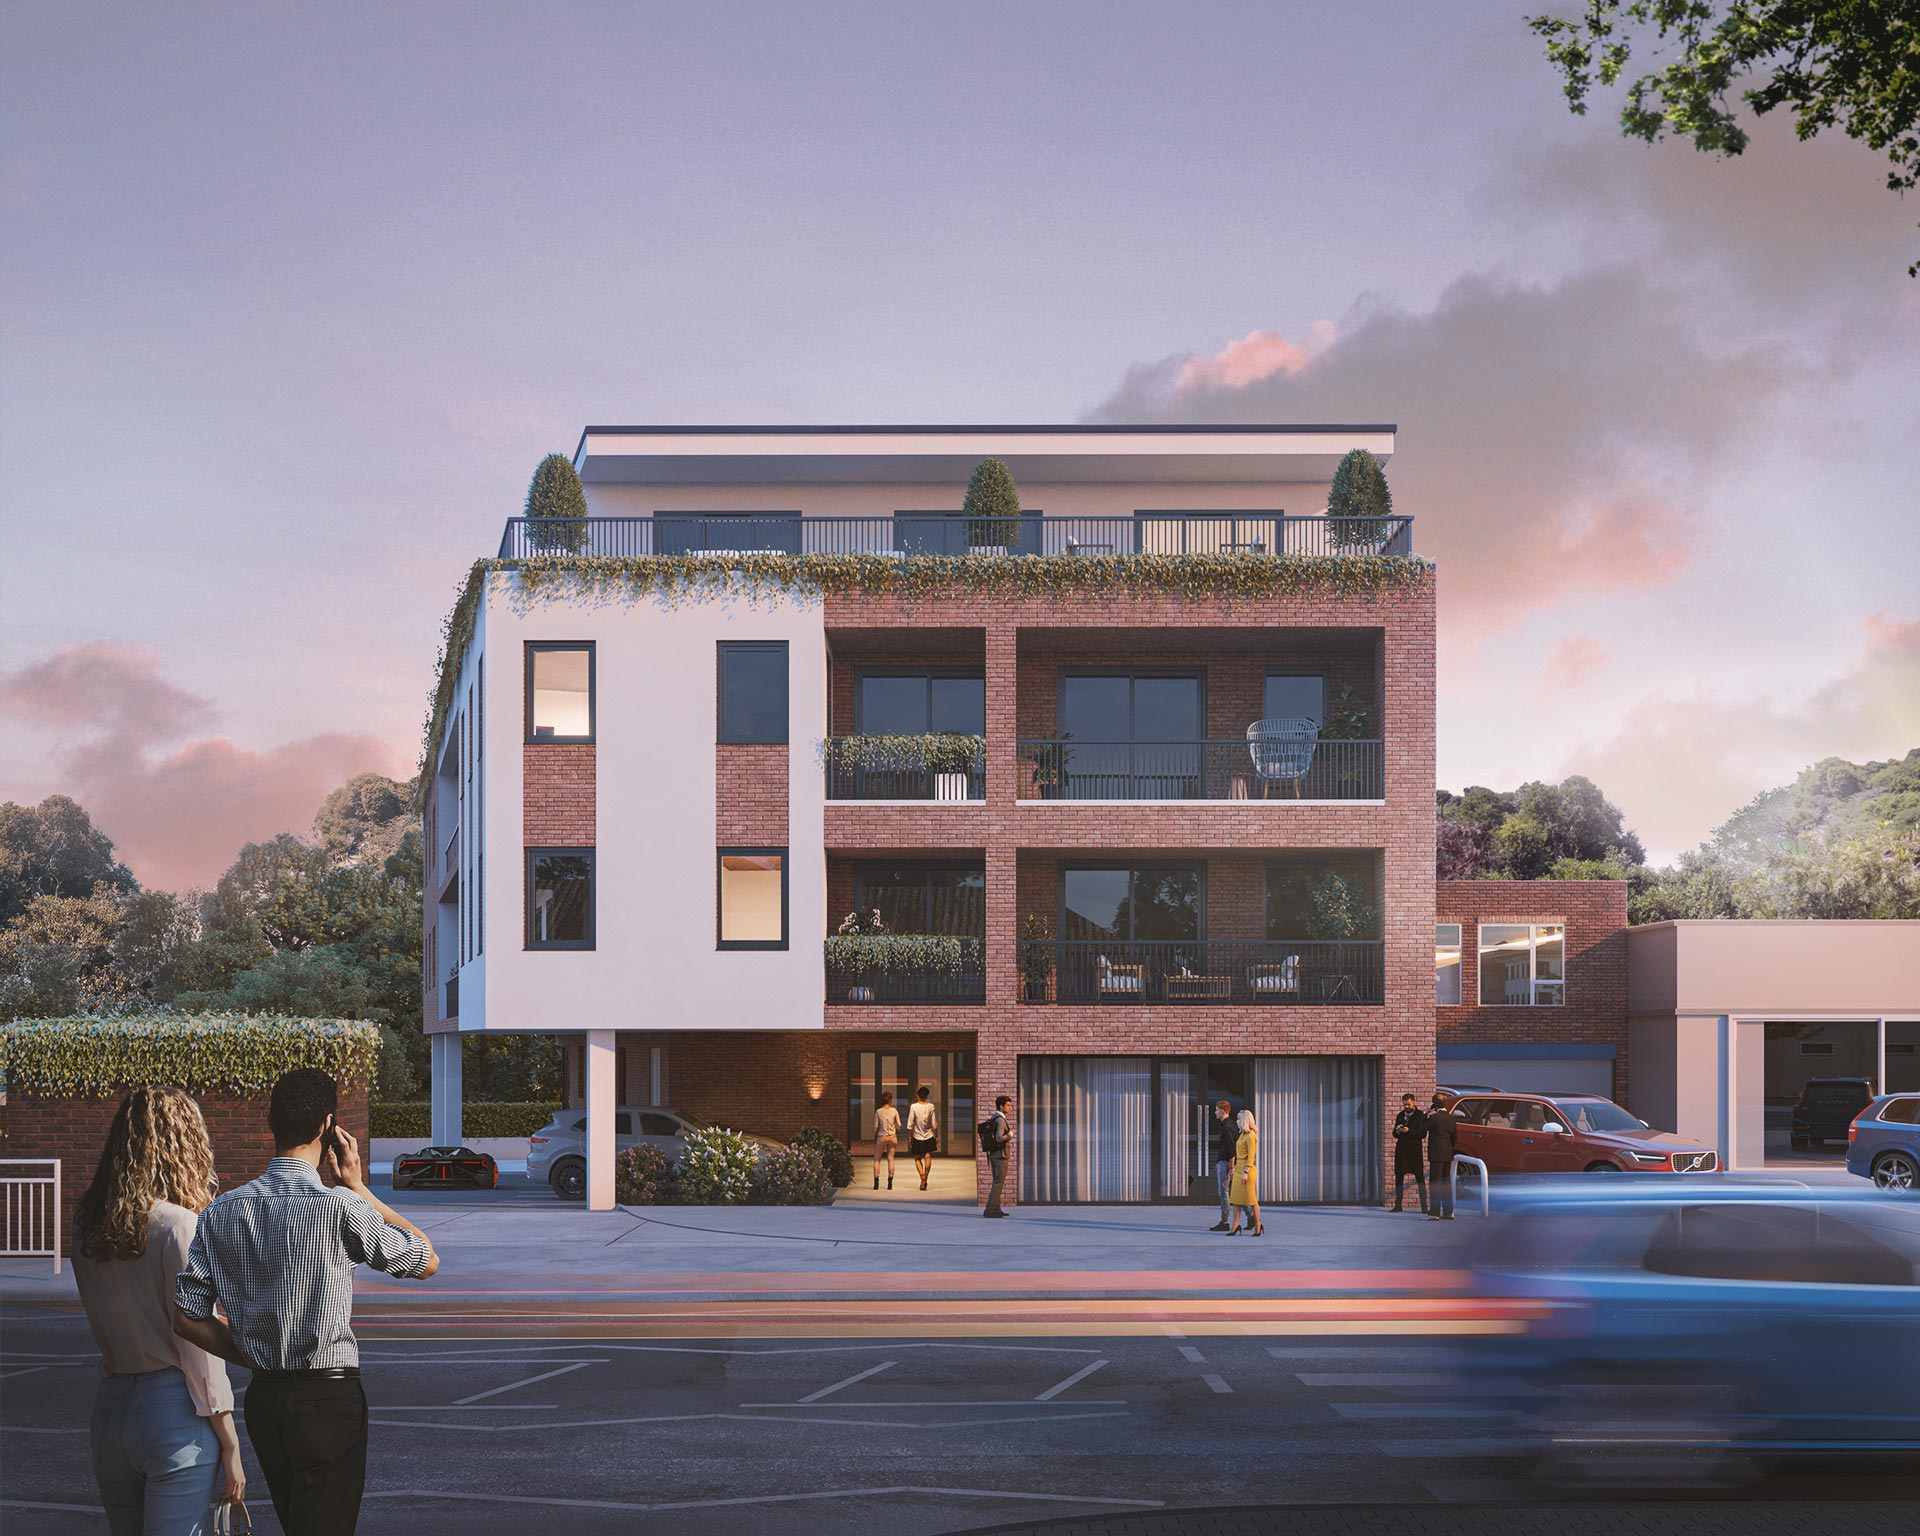 Chigwell Dusk Exterior Architectural Render